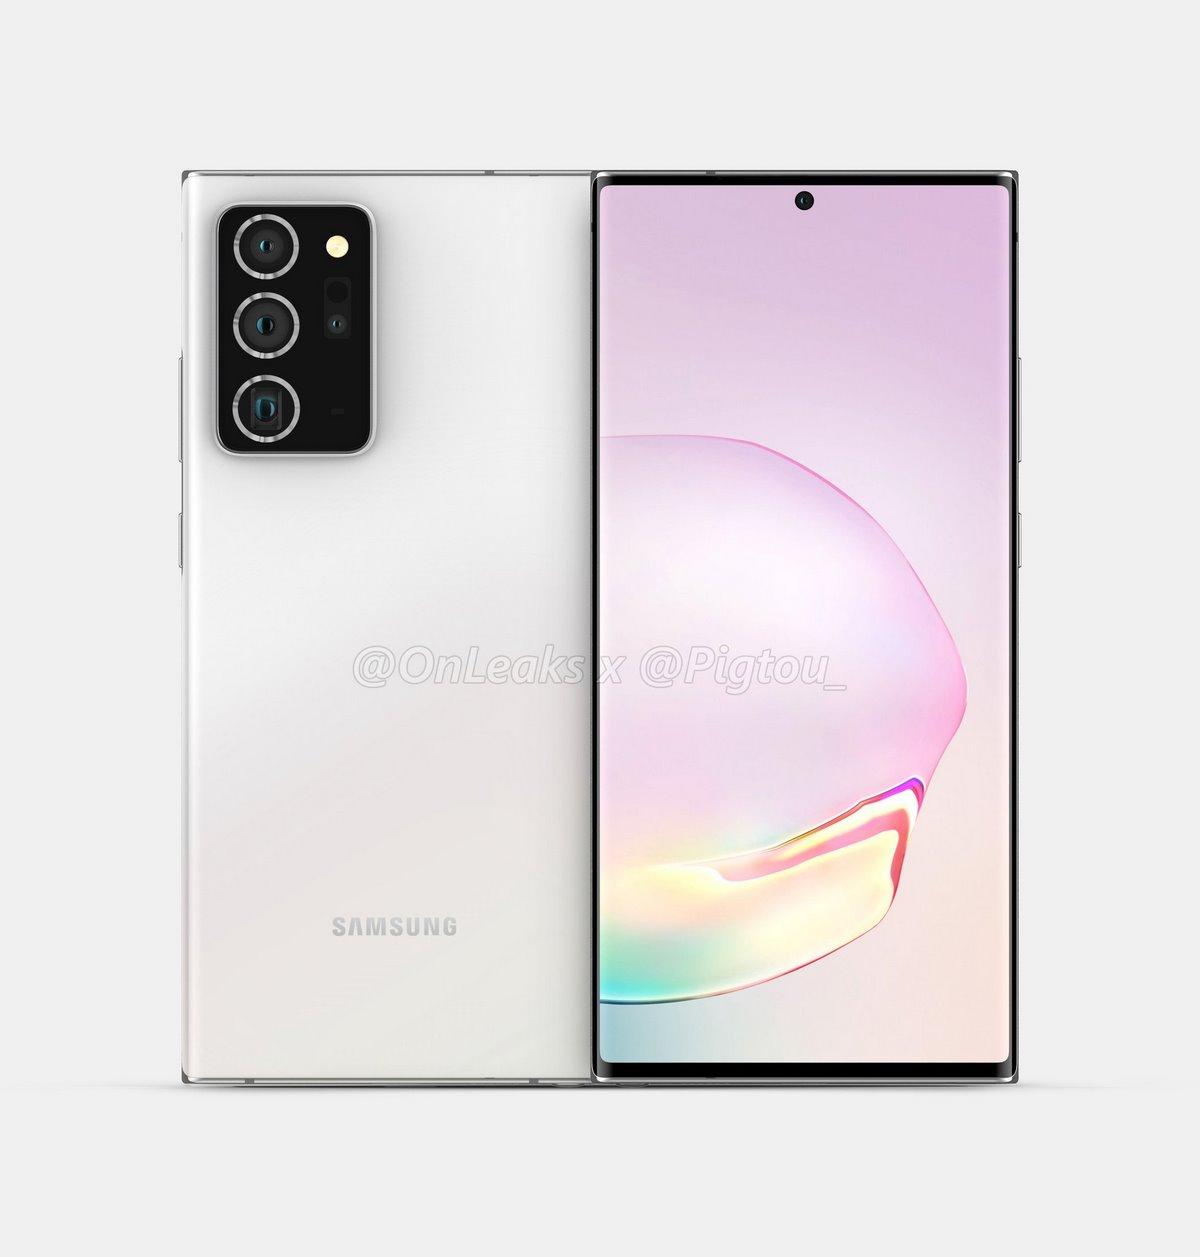 pantalla del Samsung Galaxy Note 20